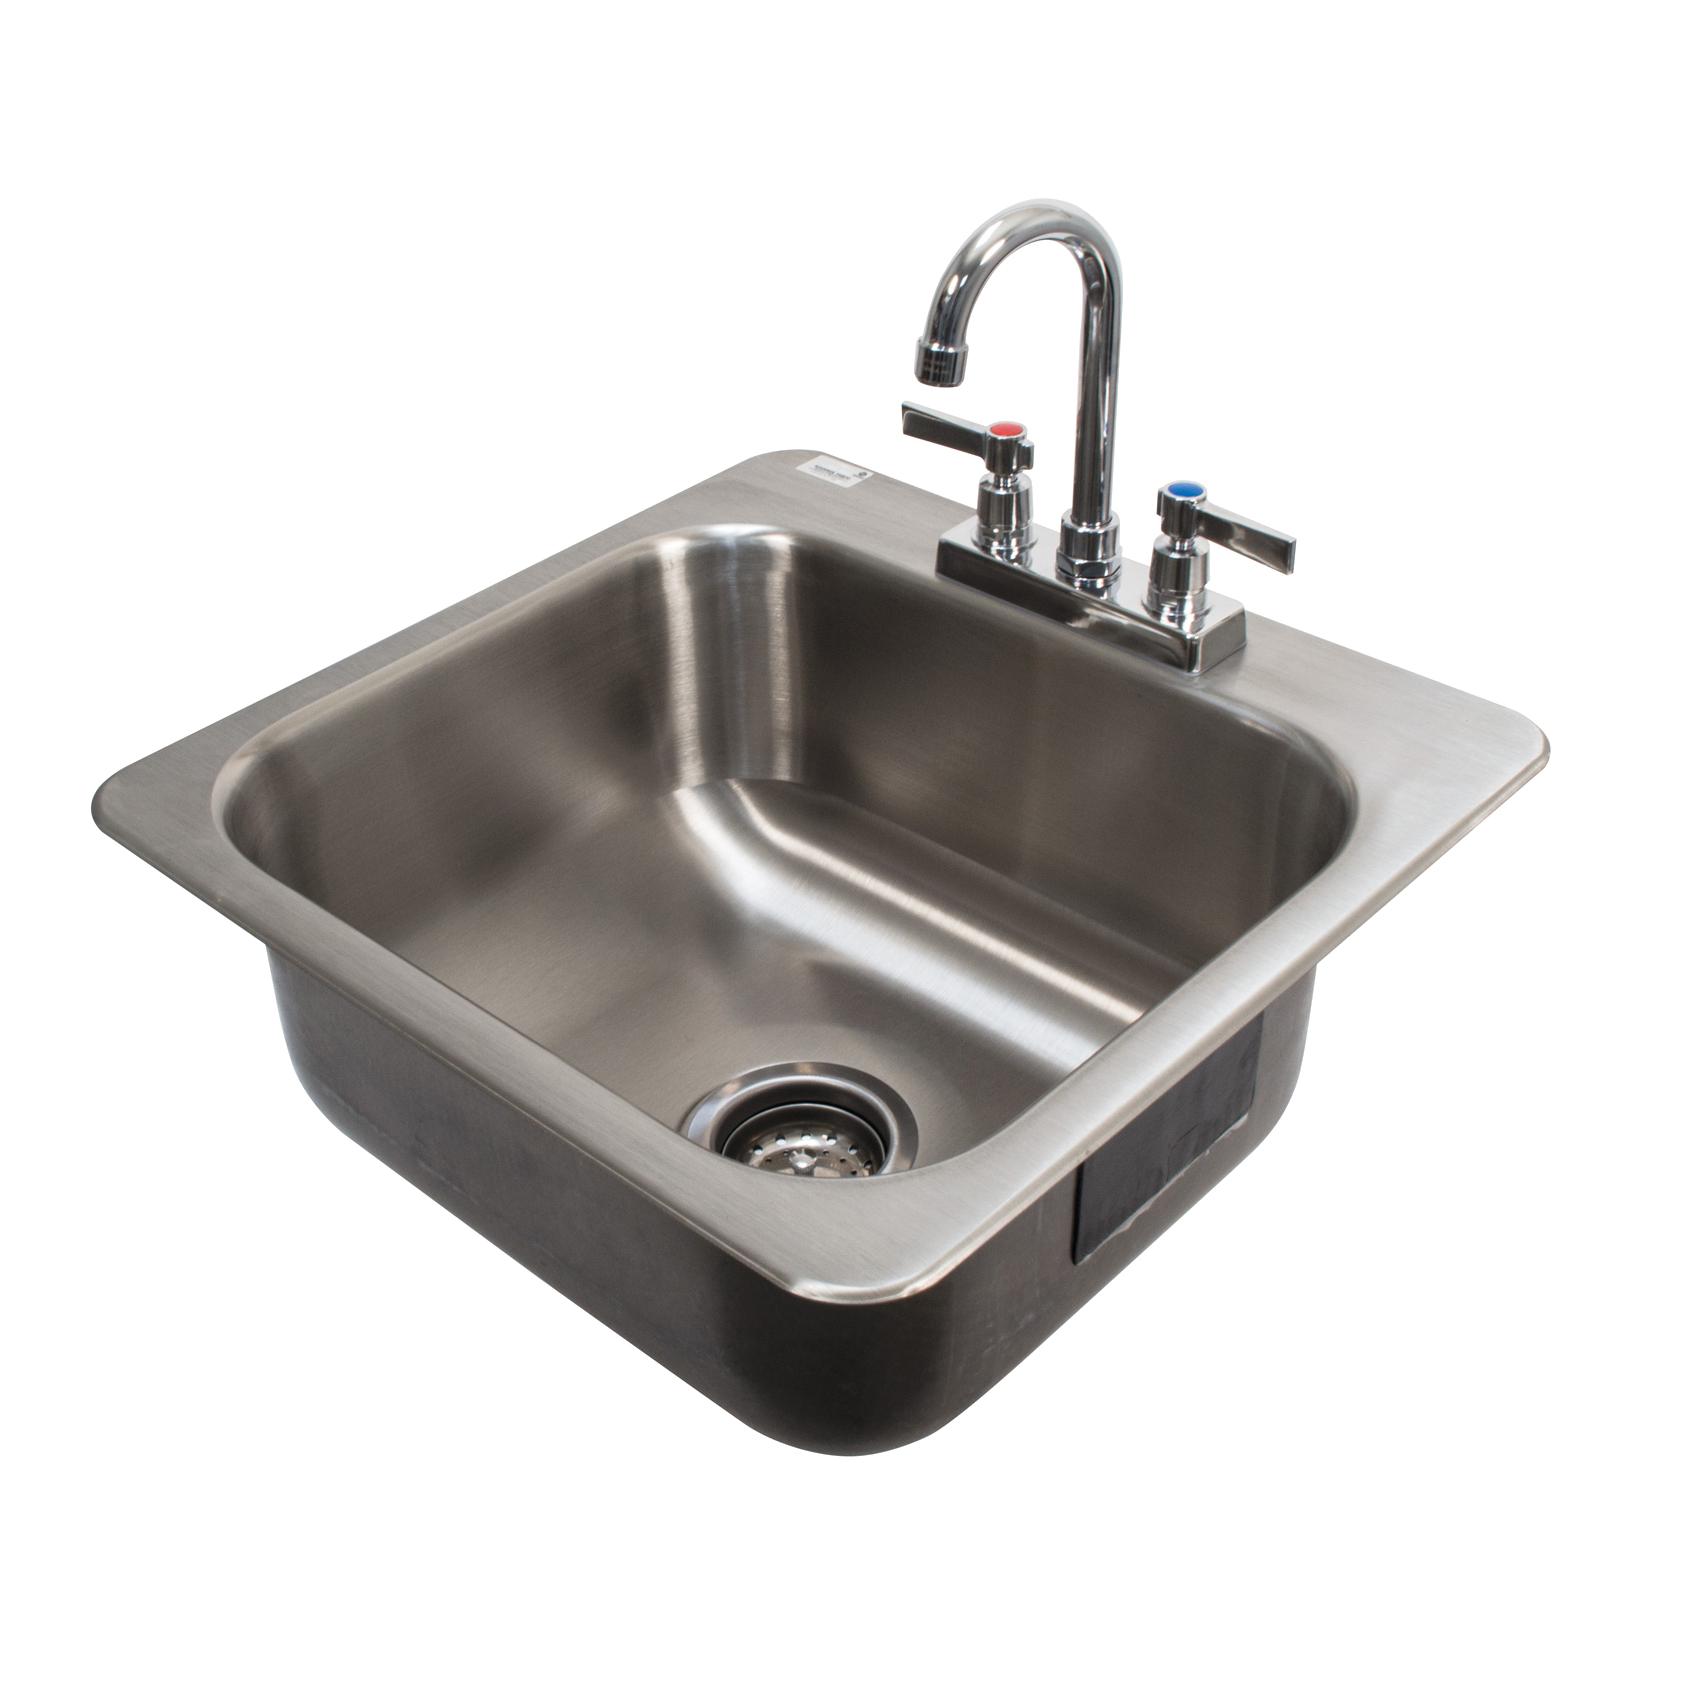 Advance Tabco DI-1-168-2X sink, drop-in